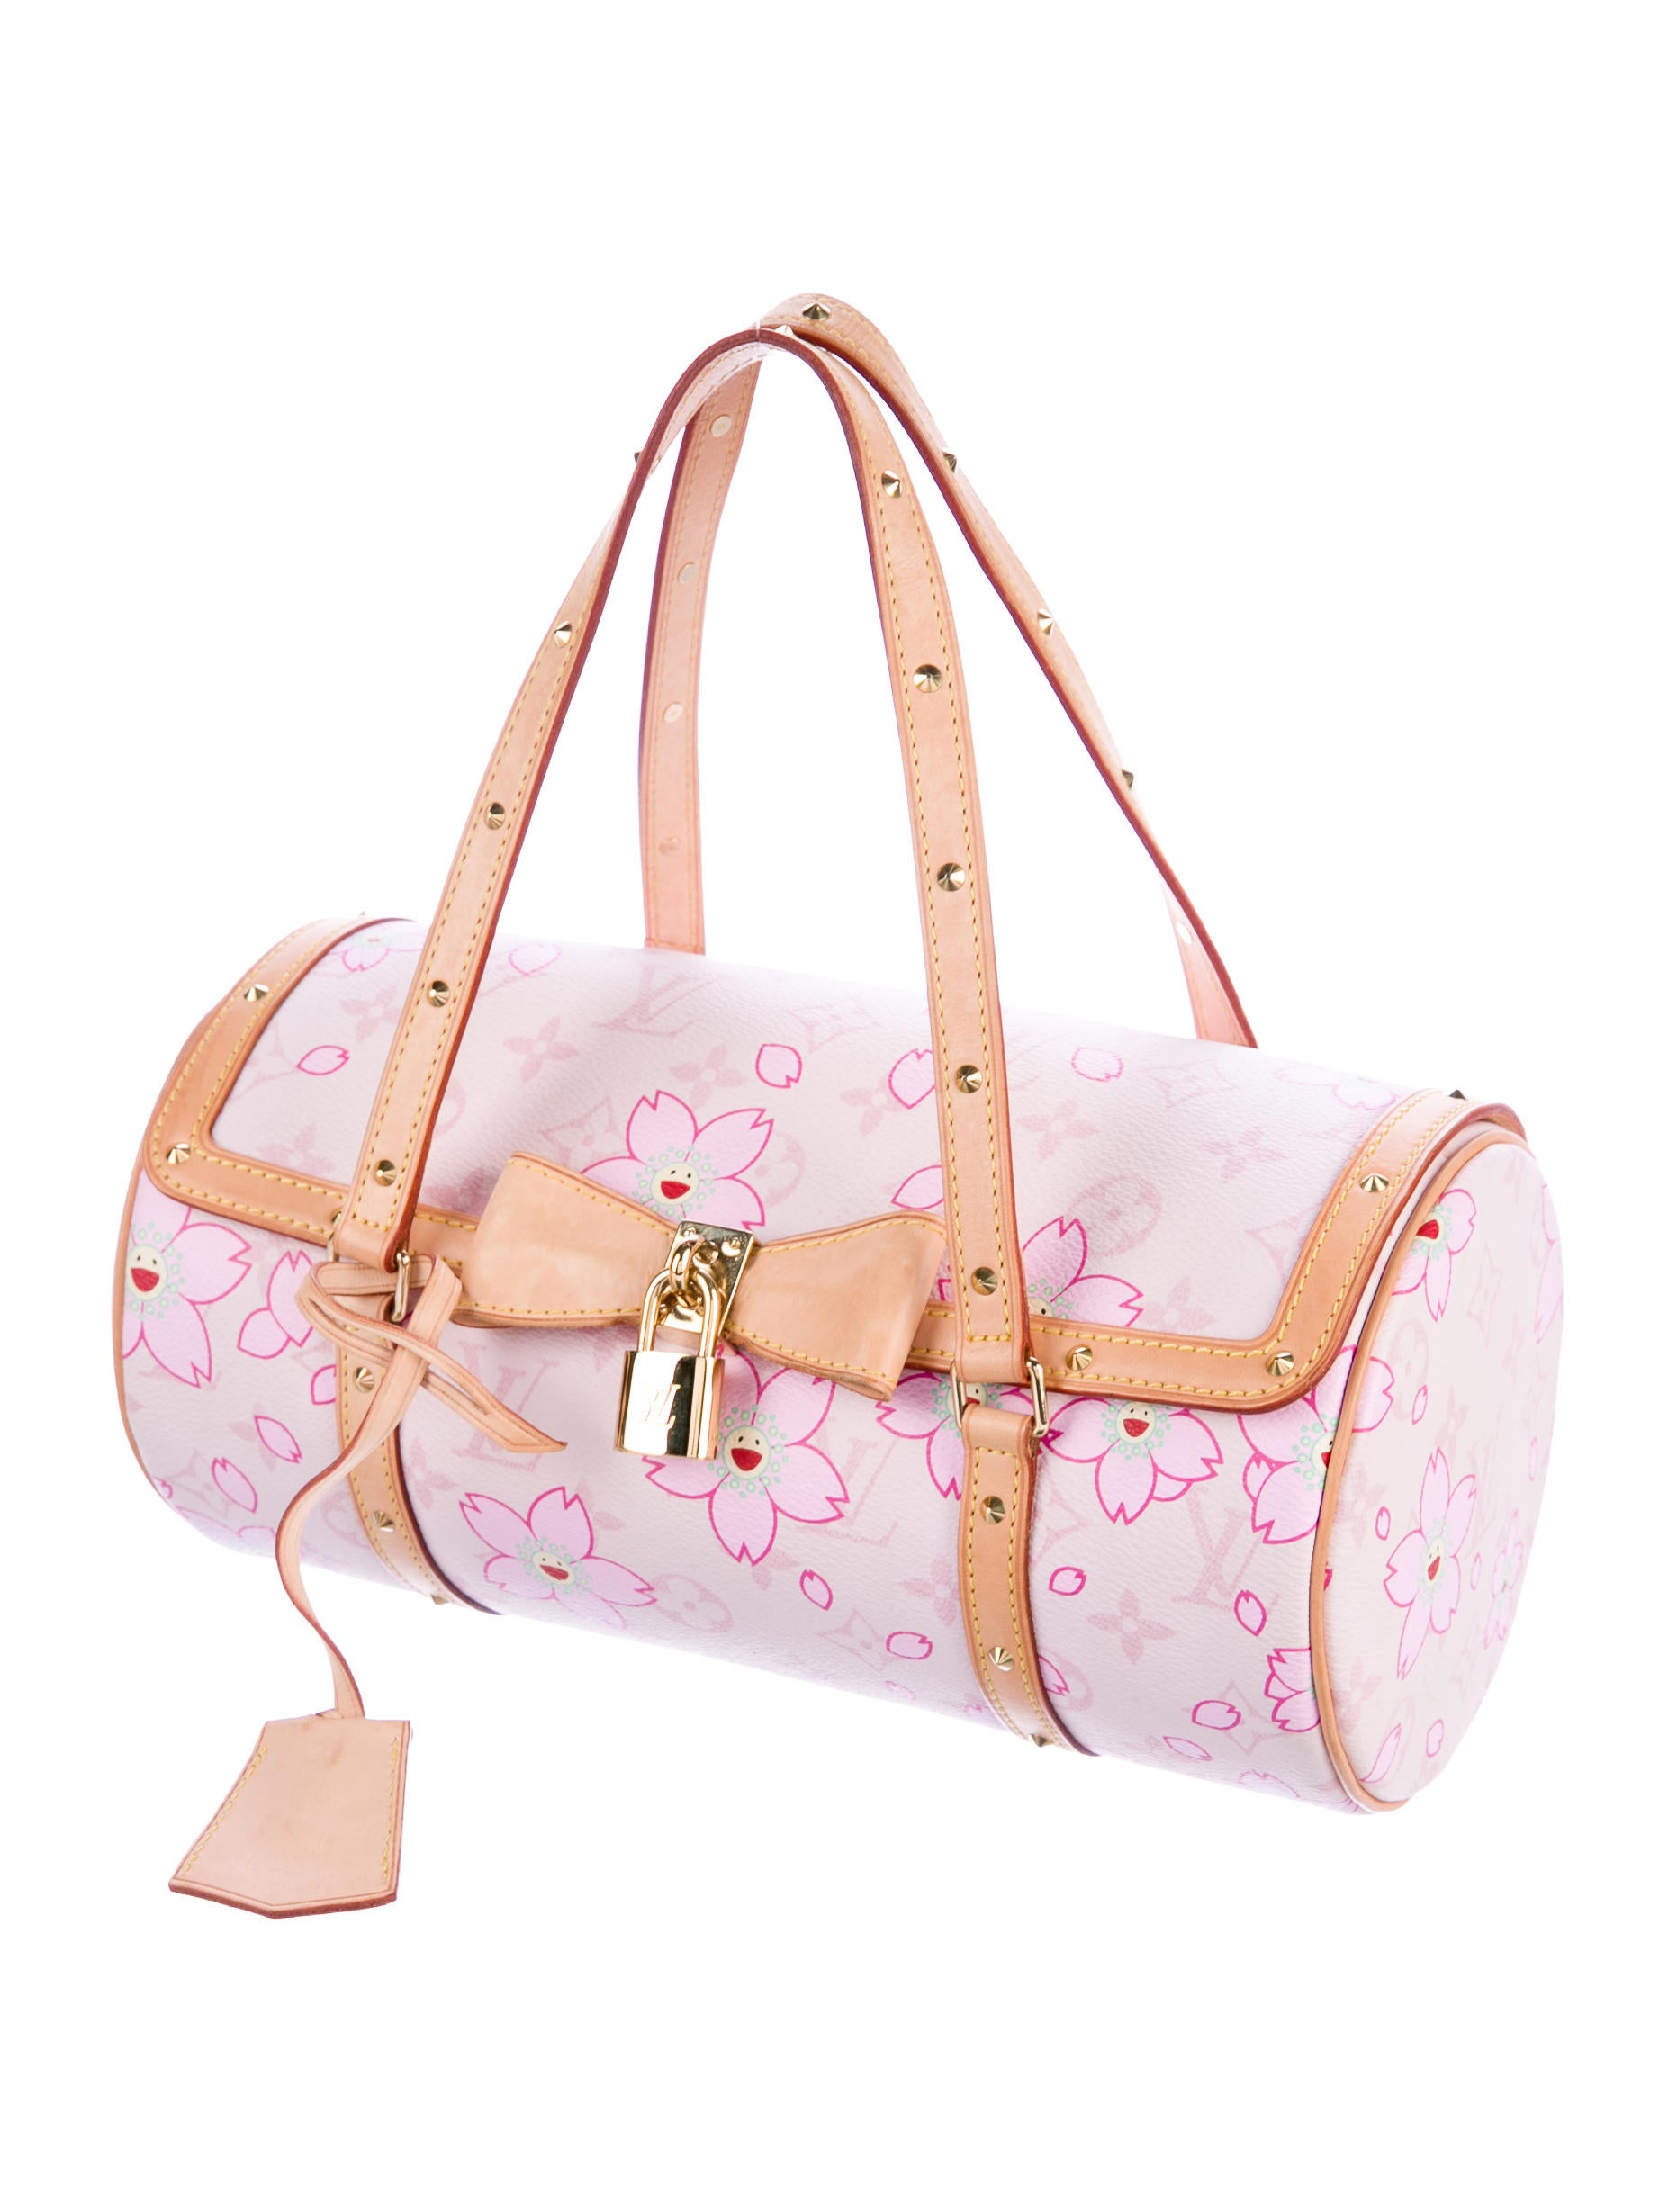 46fa5d42c347 Louis Vuitton Cherry Blossom Papillon Pink - Ontario Active School ...